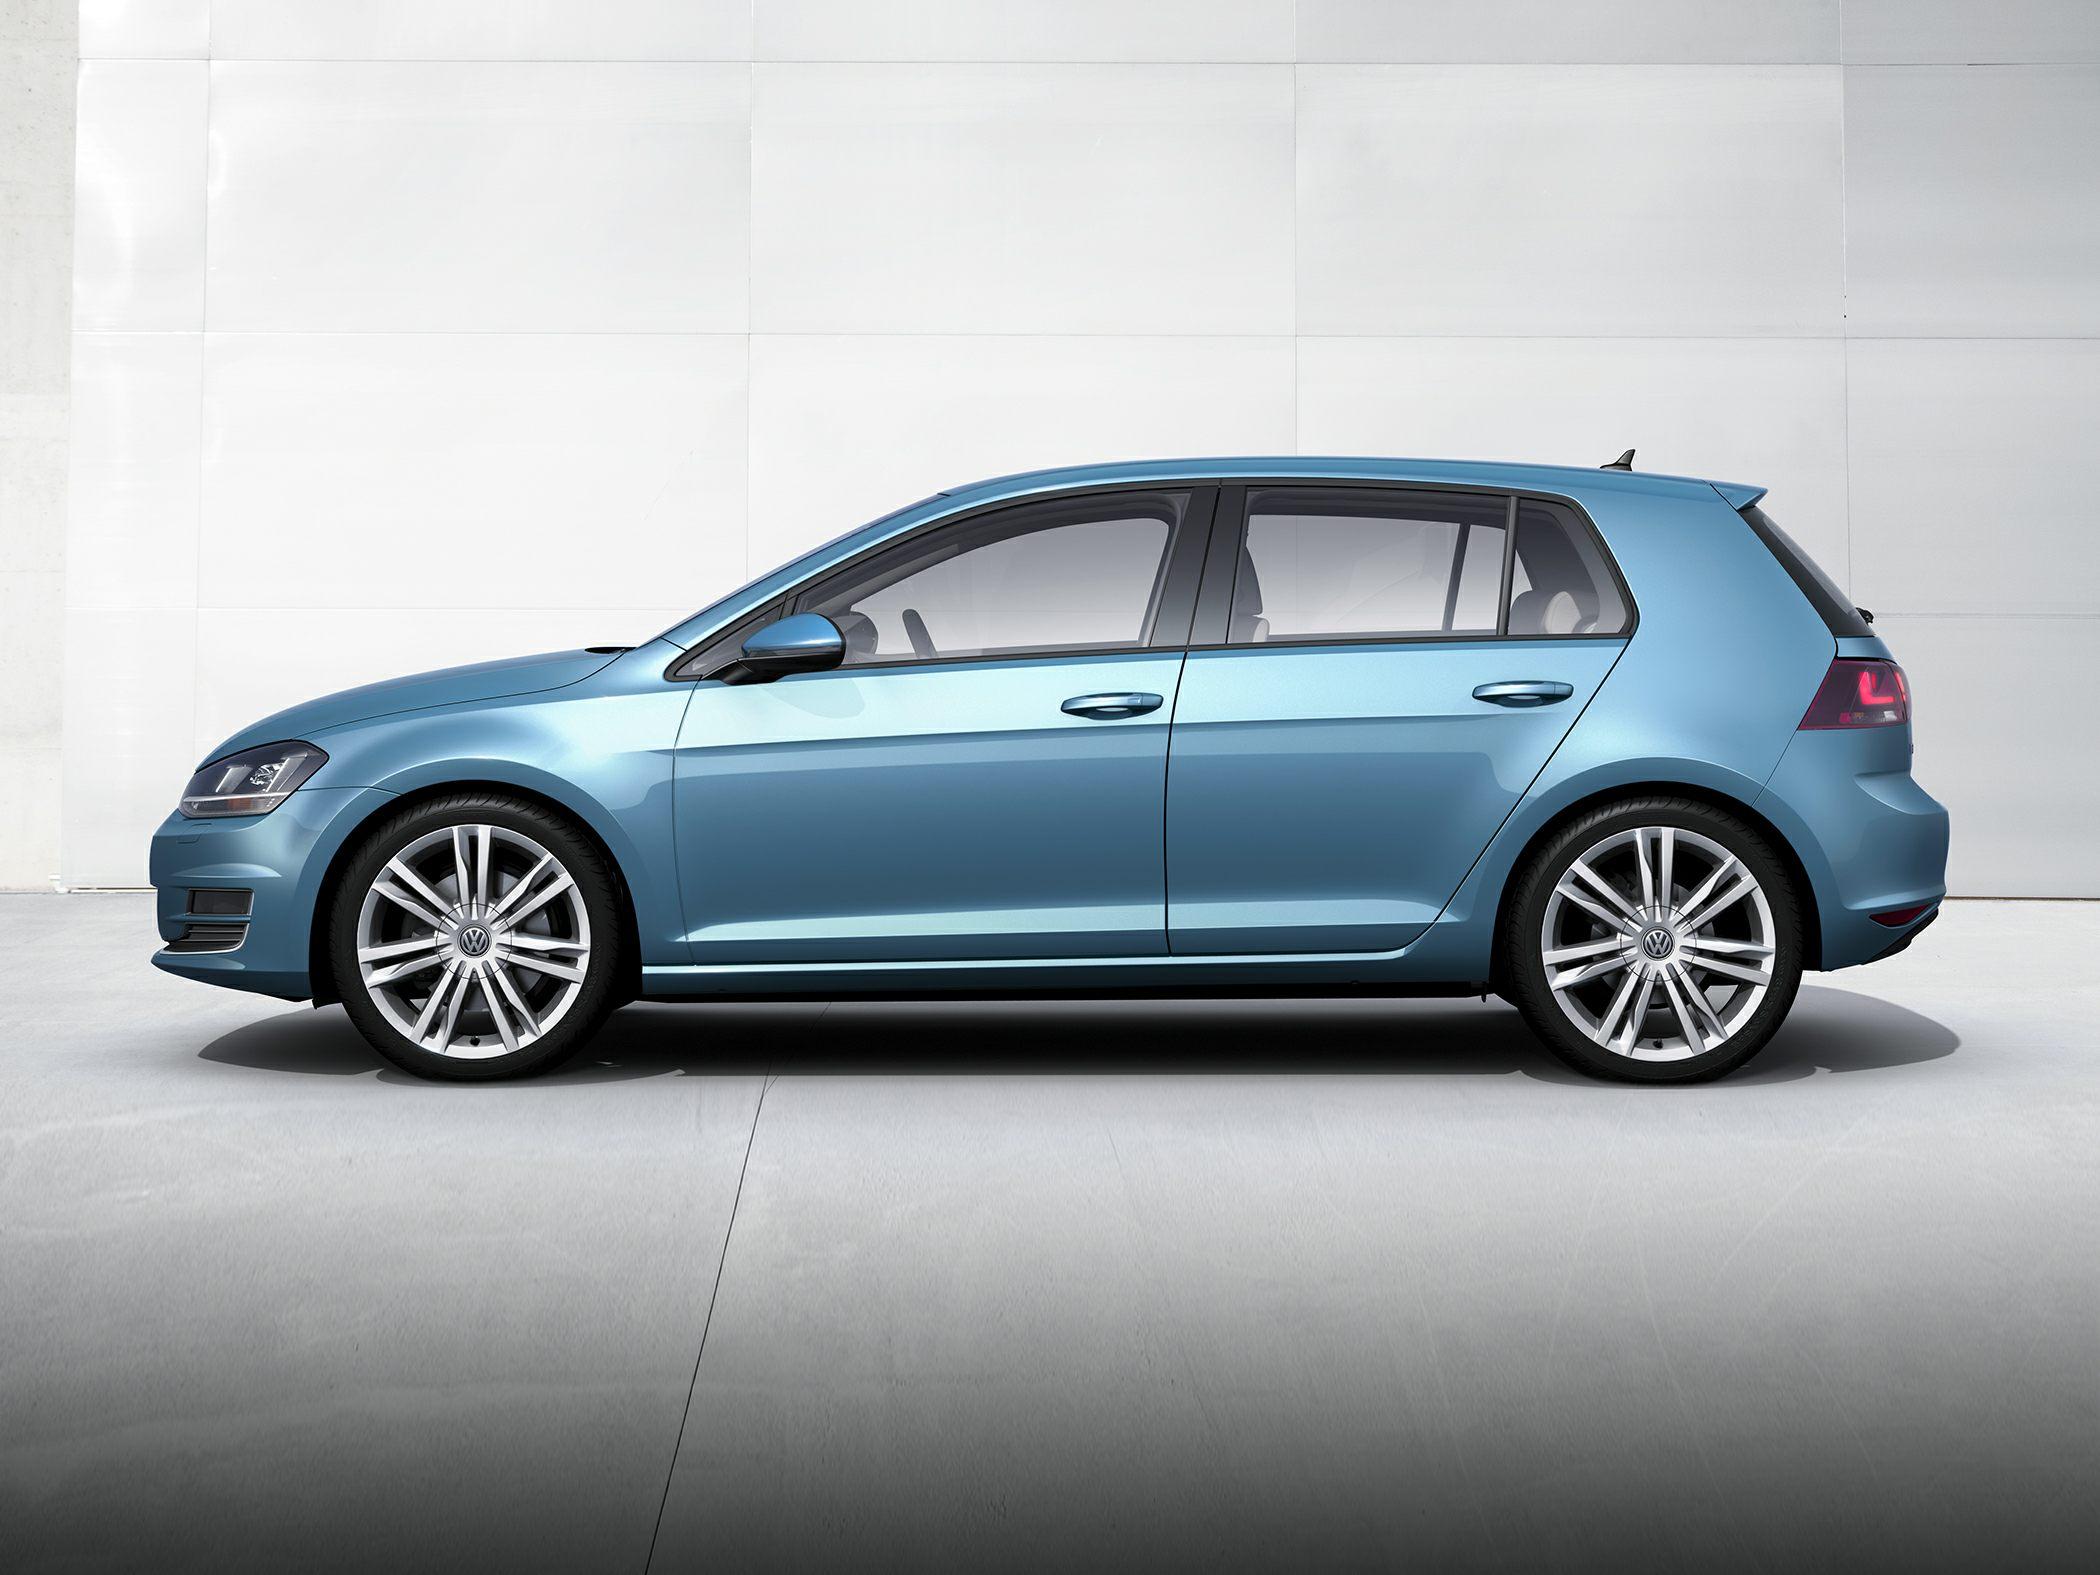 2015 Volkswagen Golf Side